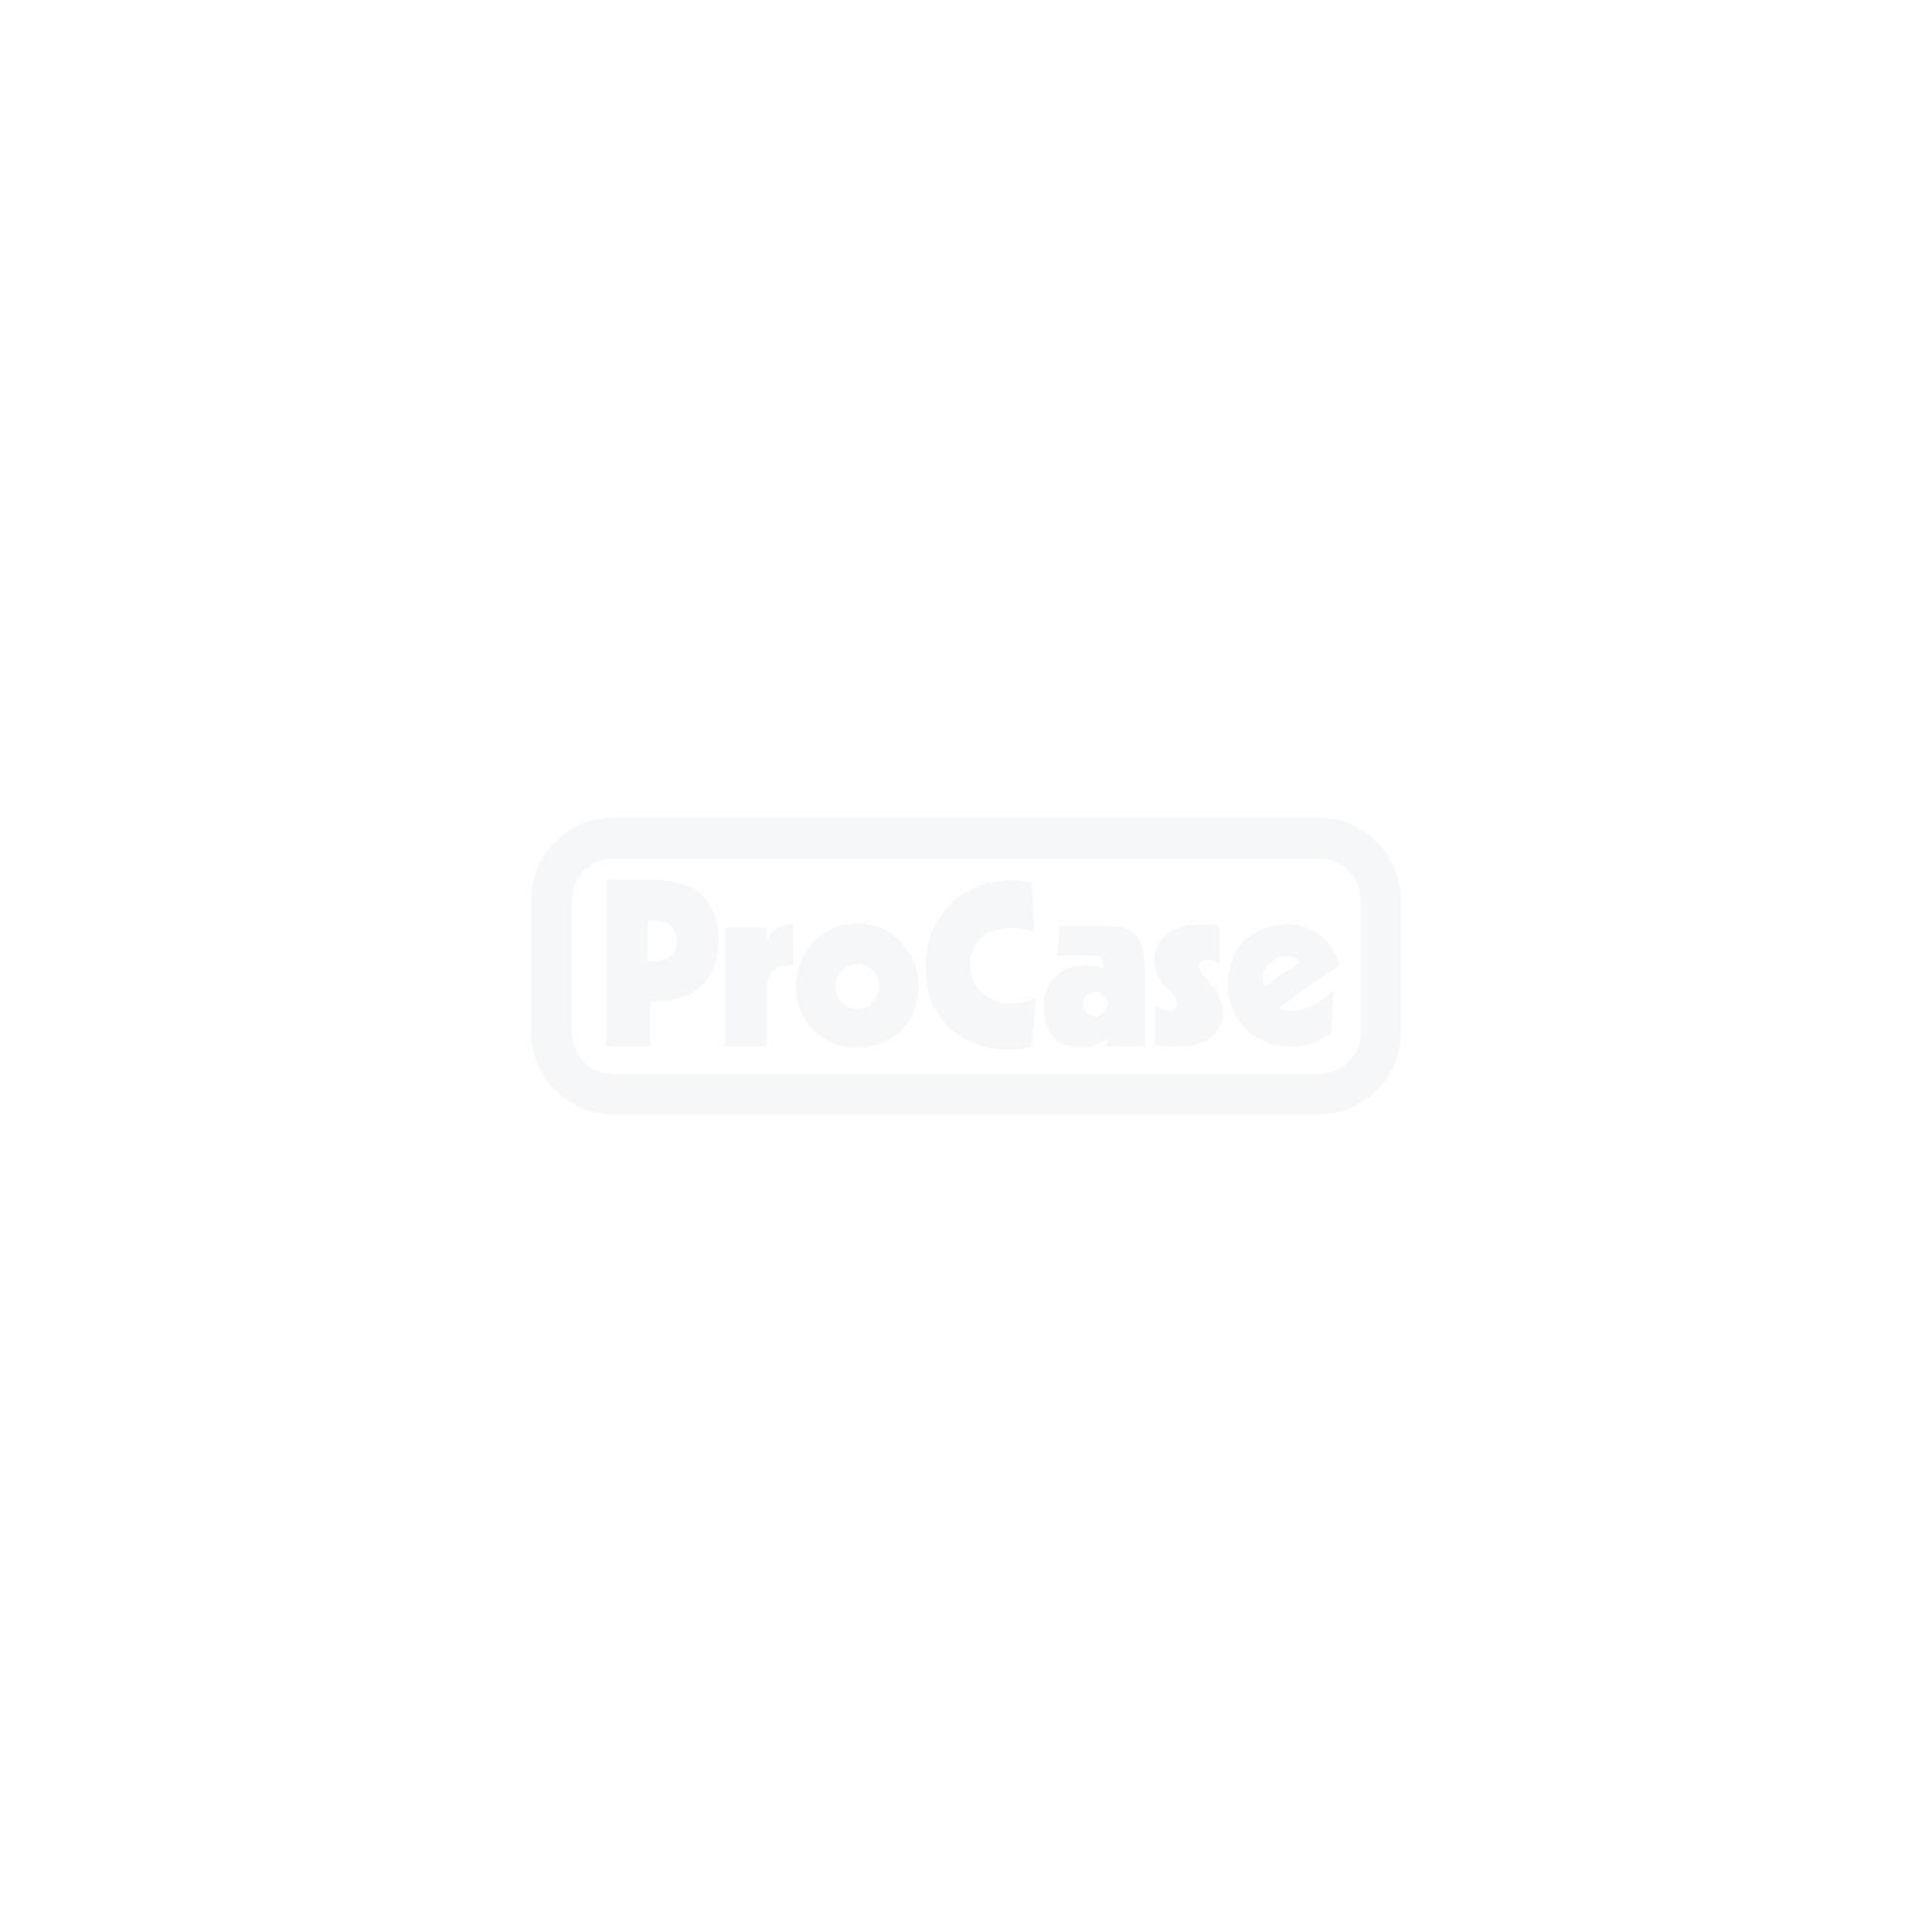 Flightcase Truhe für 1 St. Barco Lampenblock HDX LMP 2